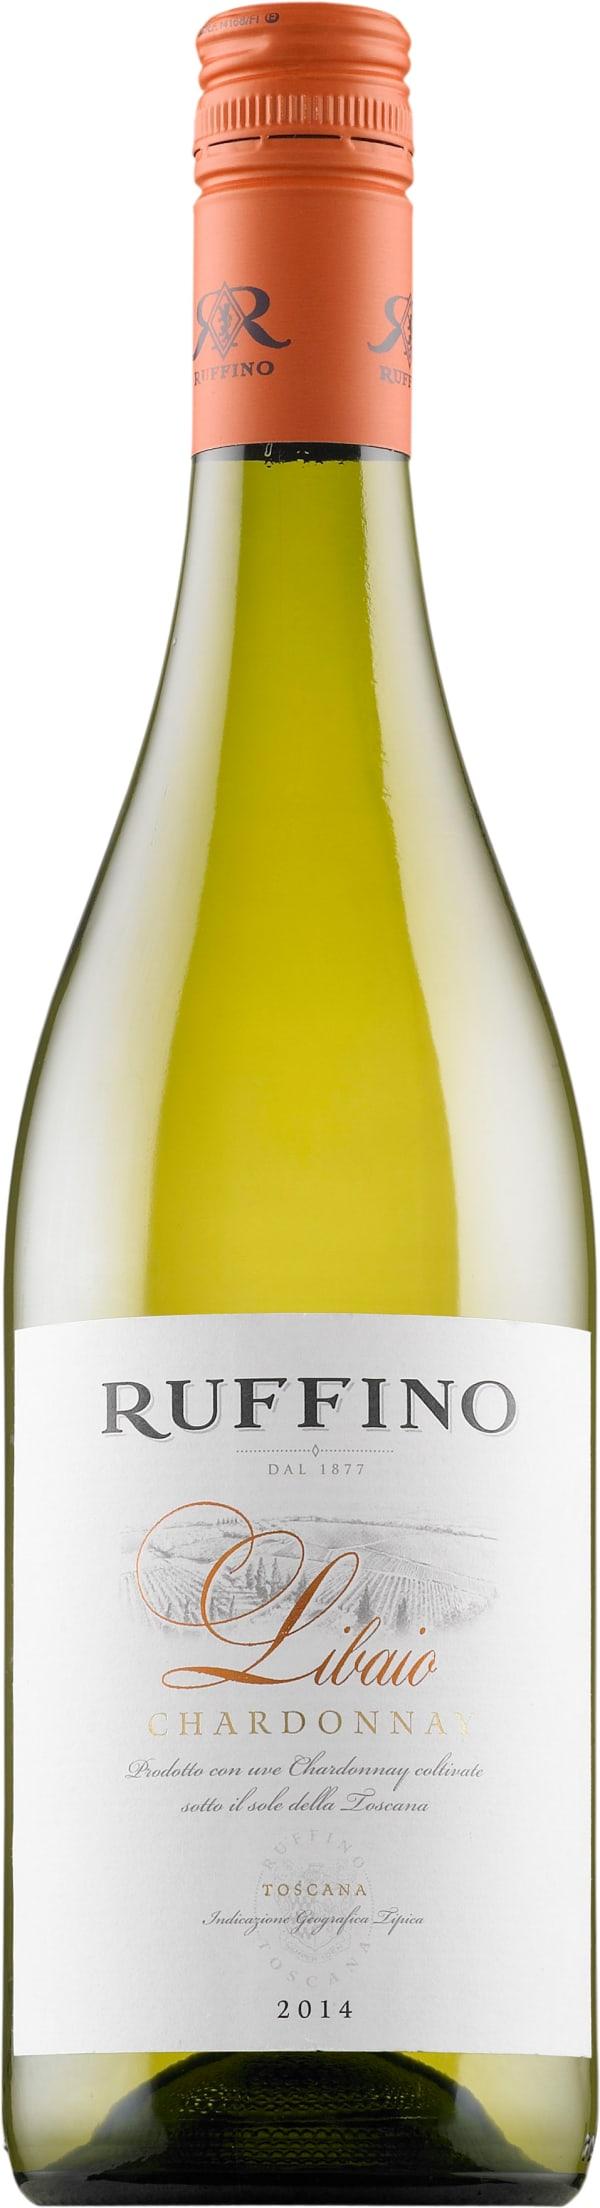 Ruffino Libaio Chardonnay 2017